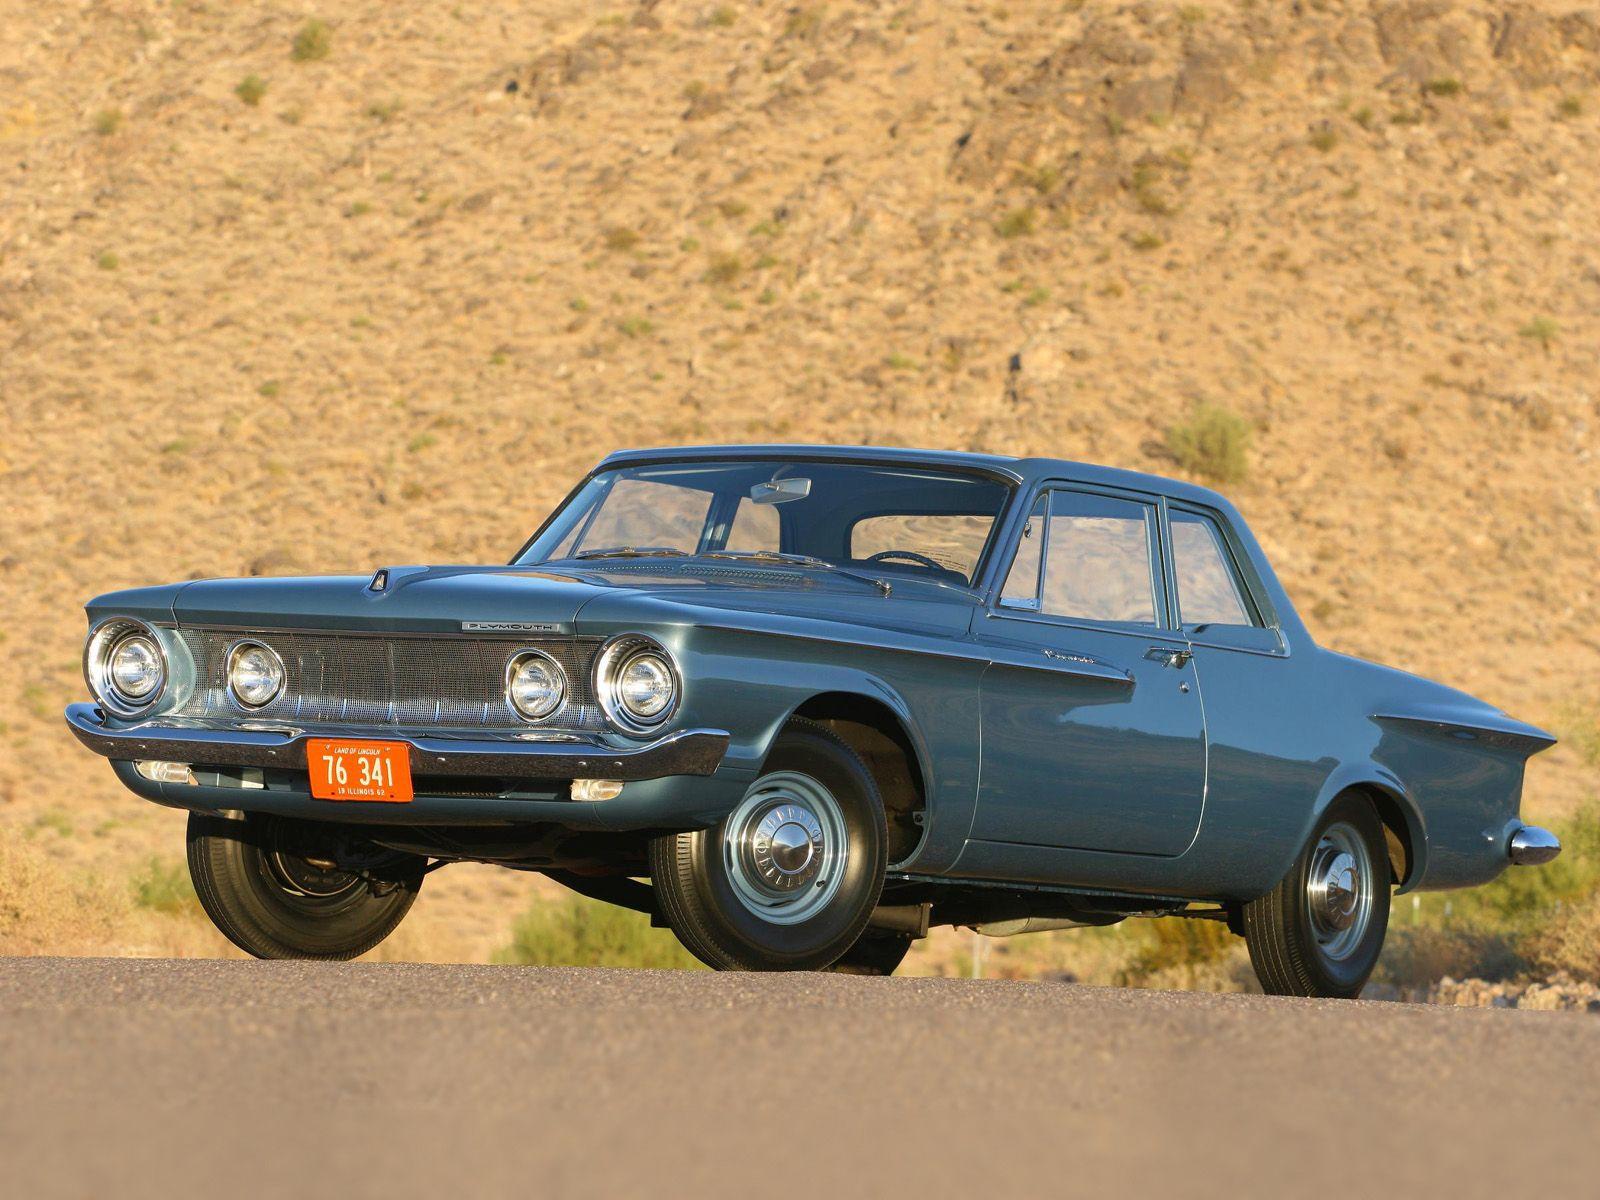 1962 Plymouth Savoy | Bucket list | Pinterest | Plymouth, Car pics ...